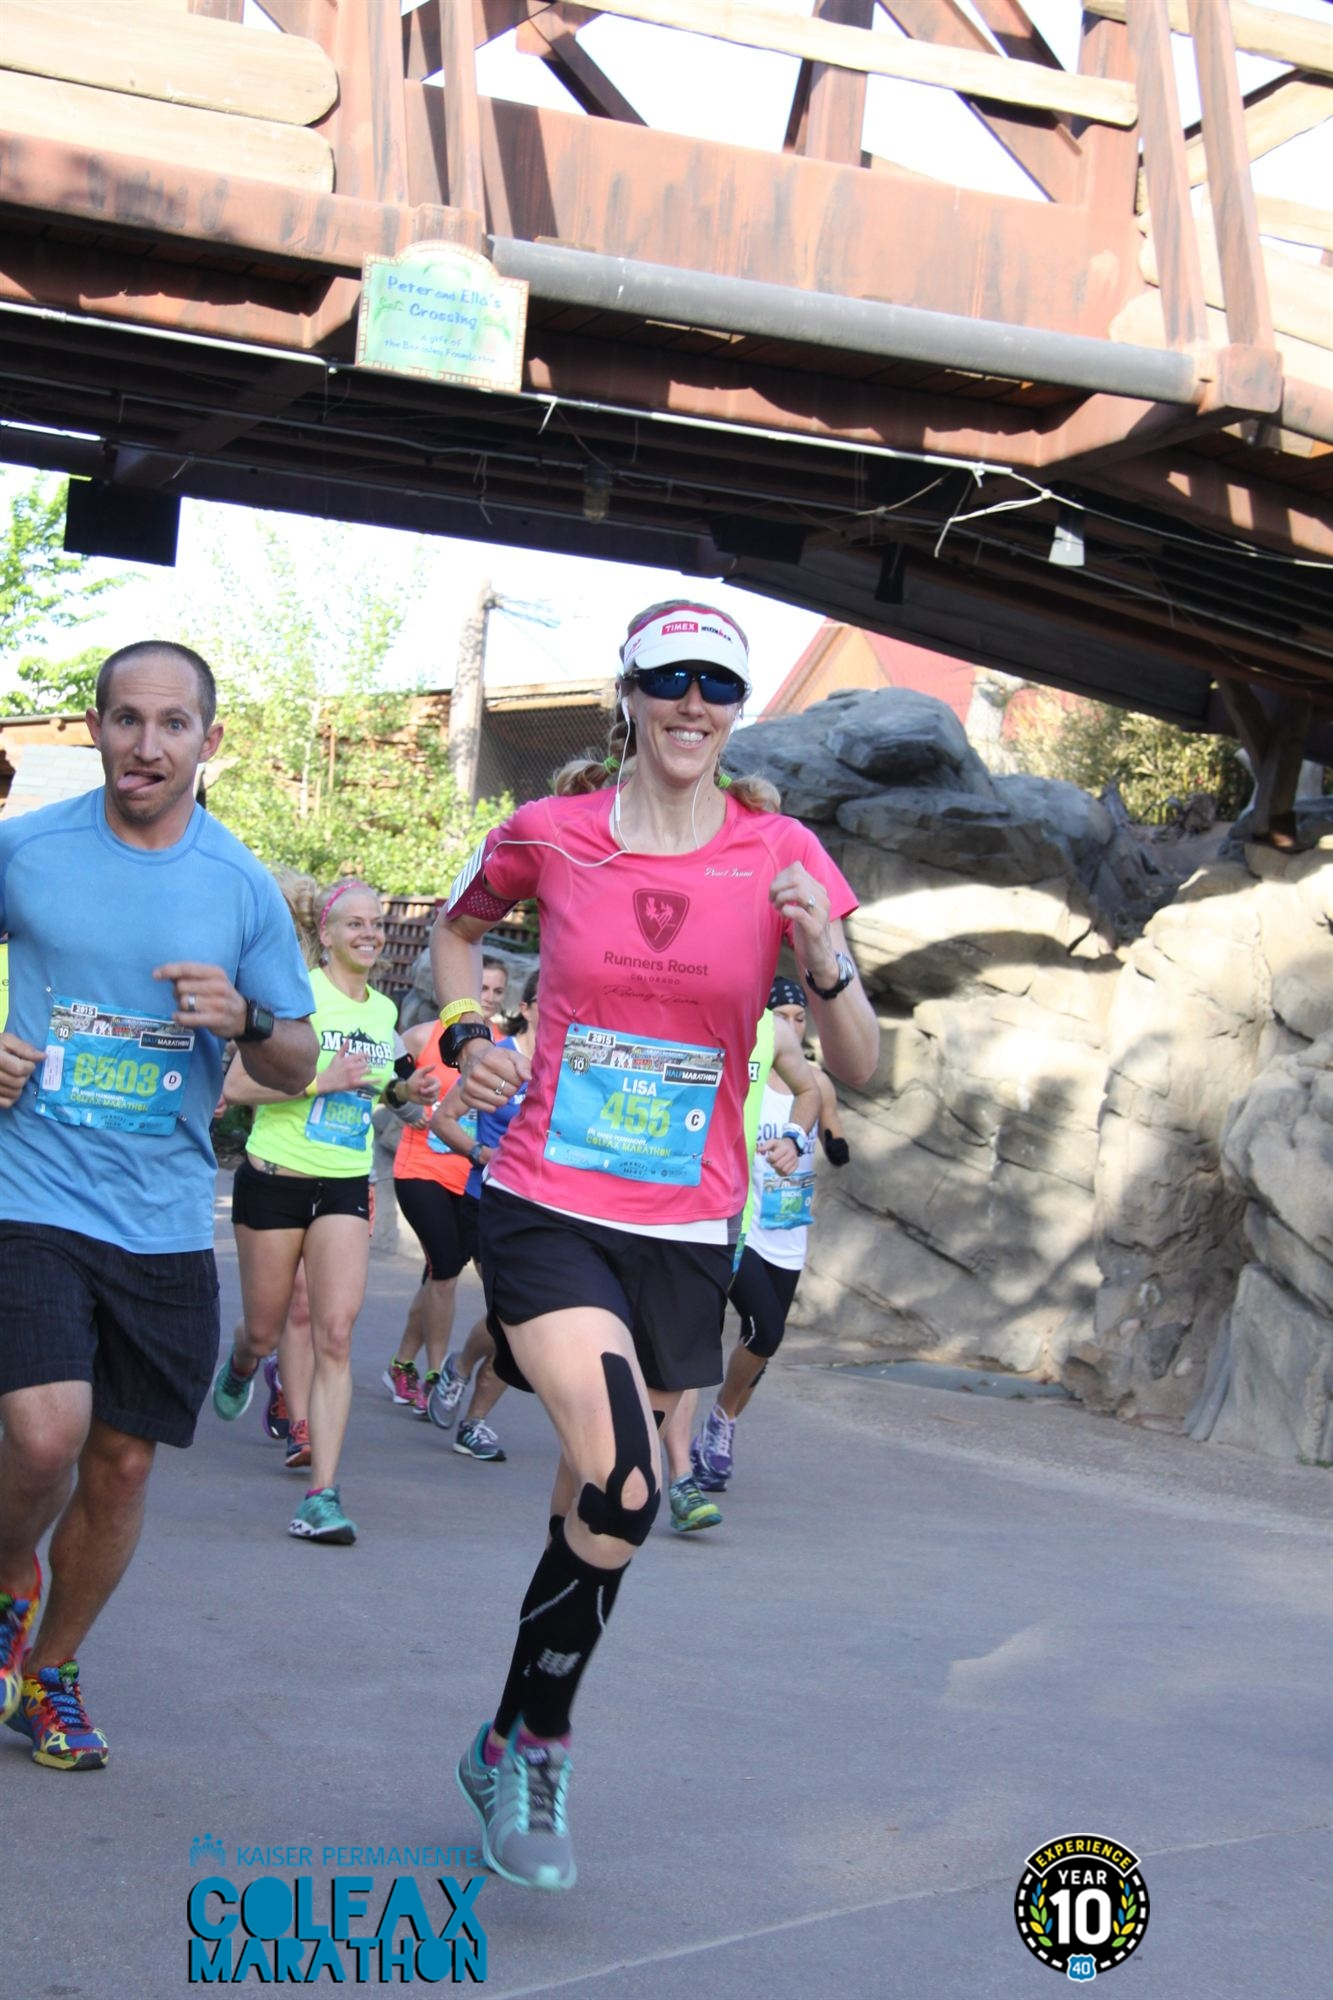 Running the Colfax Half Marathon